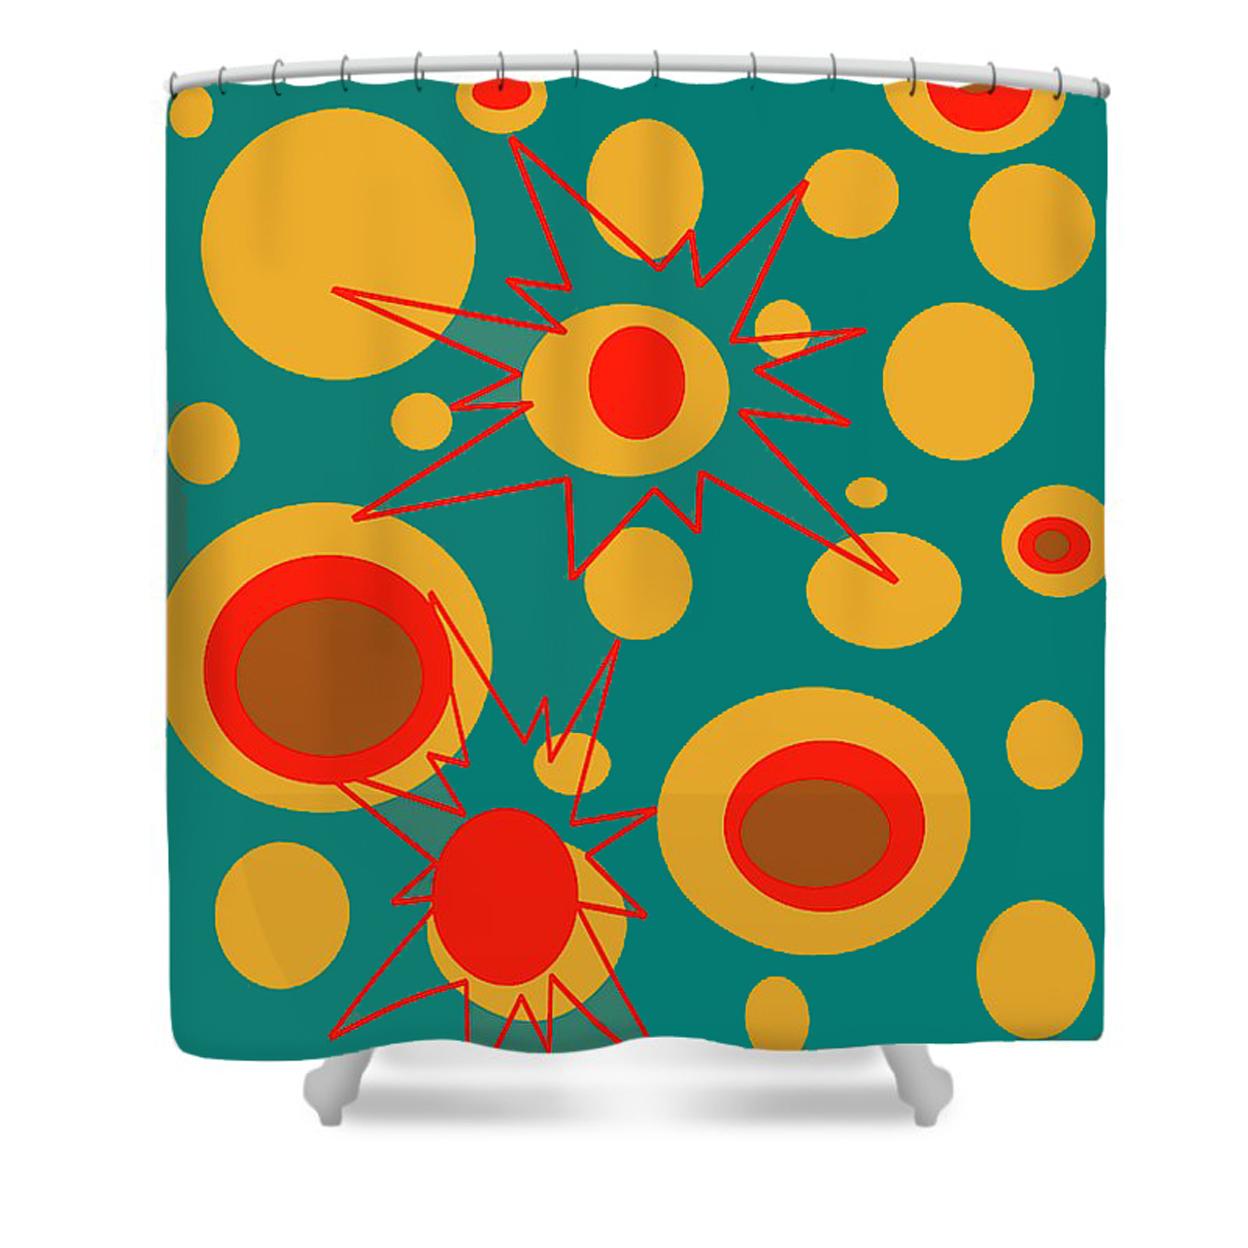 Shower Curtain - Crash Pad Designs Oliver